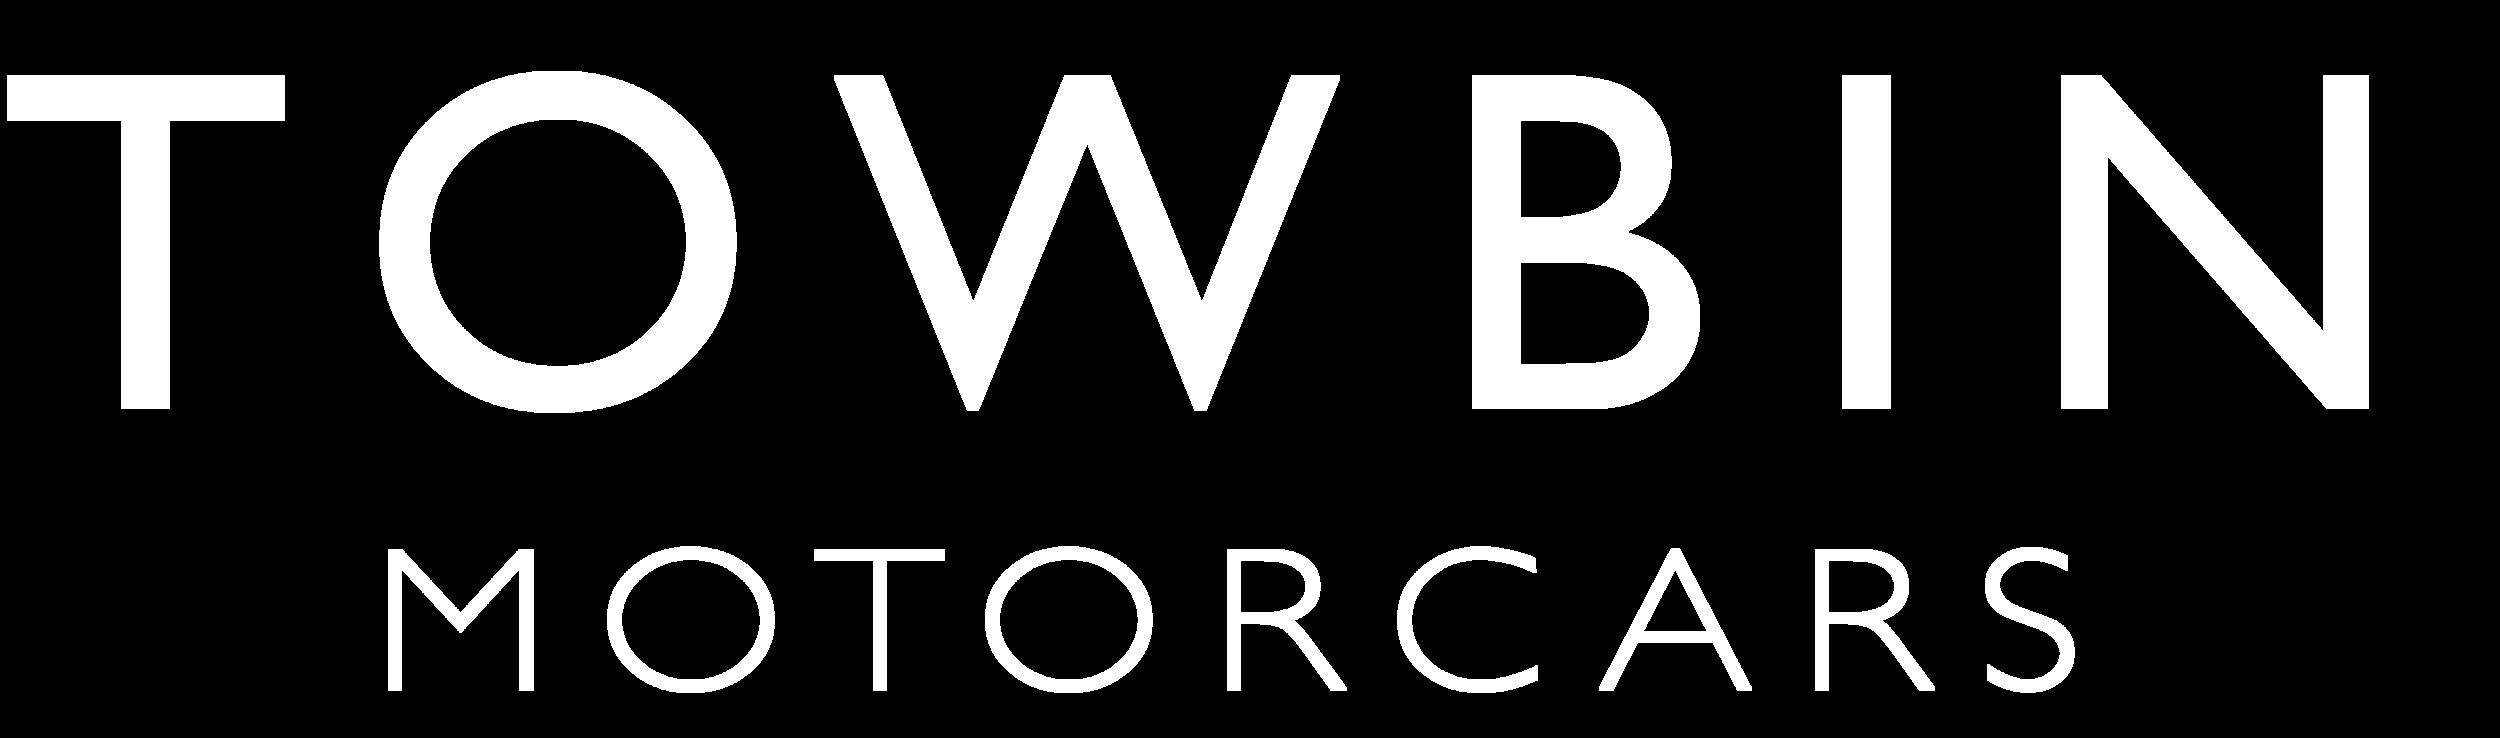 Towbin-Motorcars-New-Logo-White.png